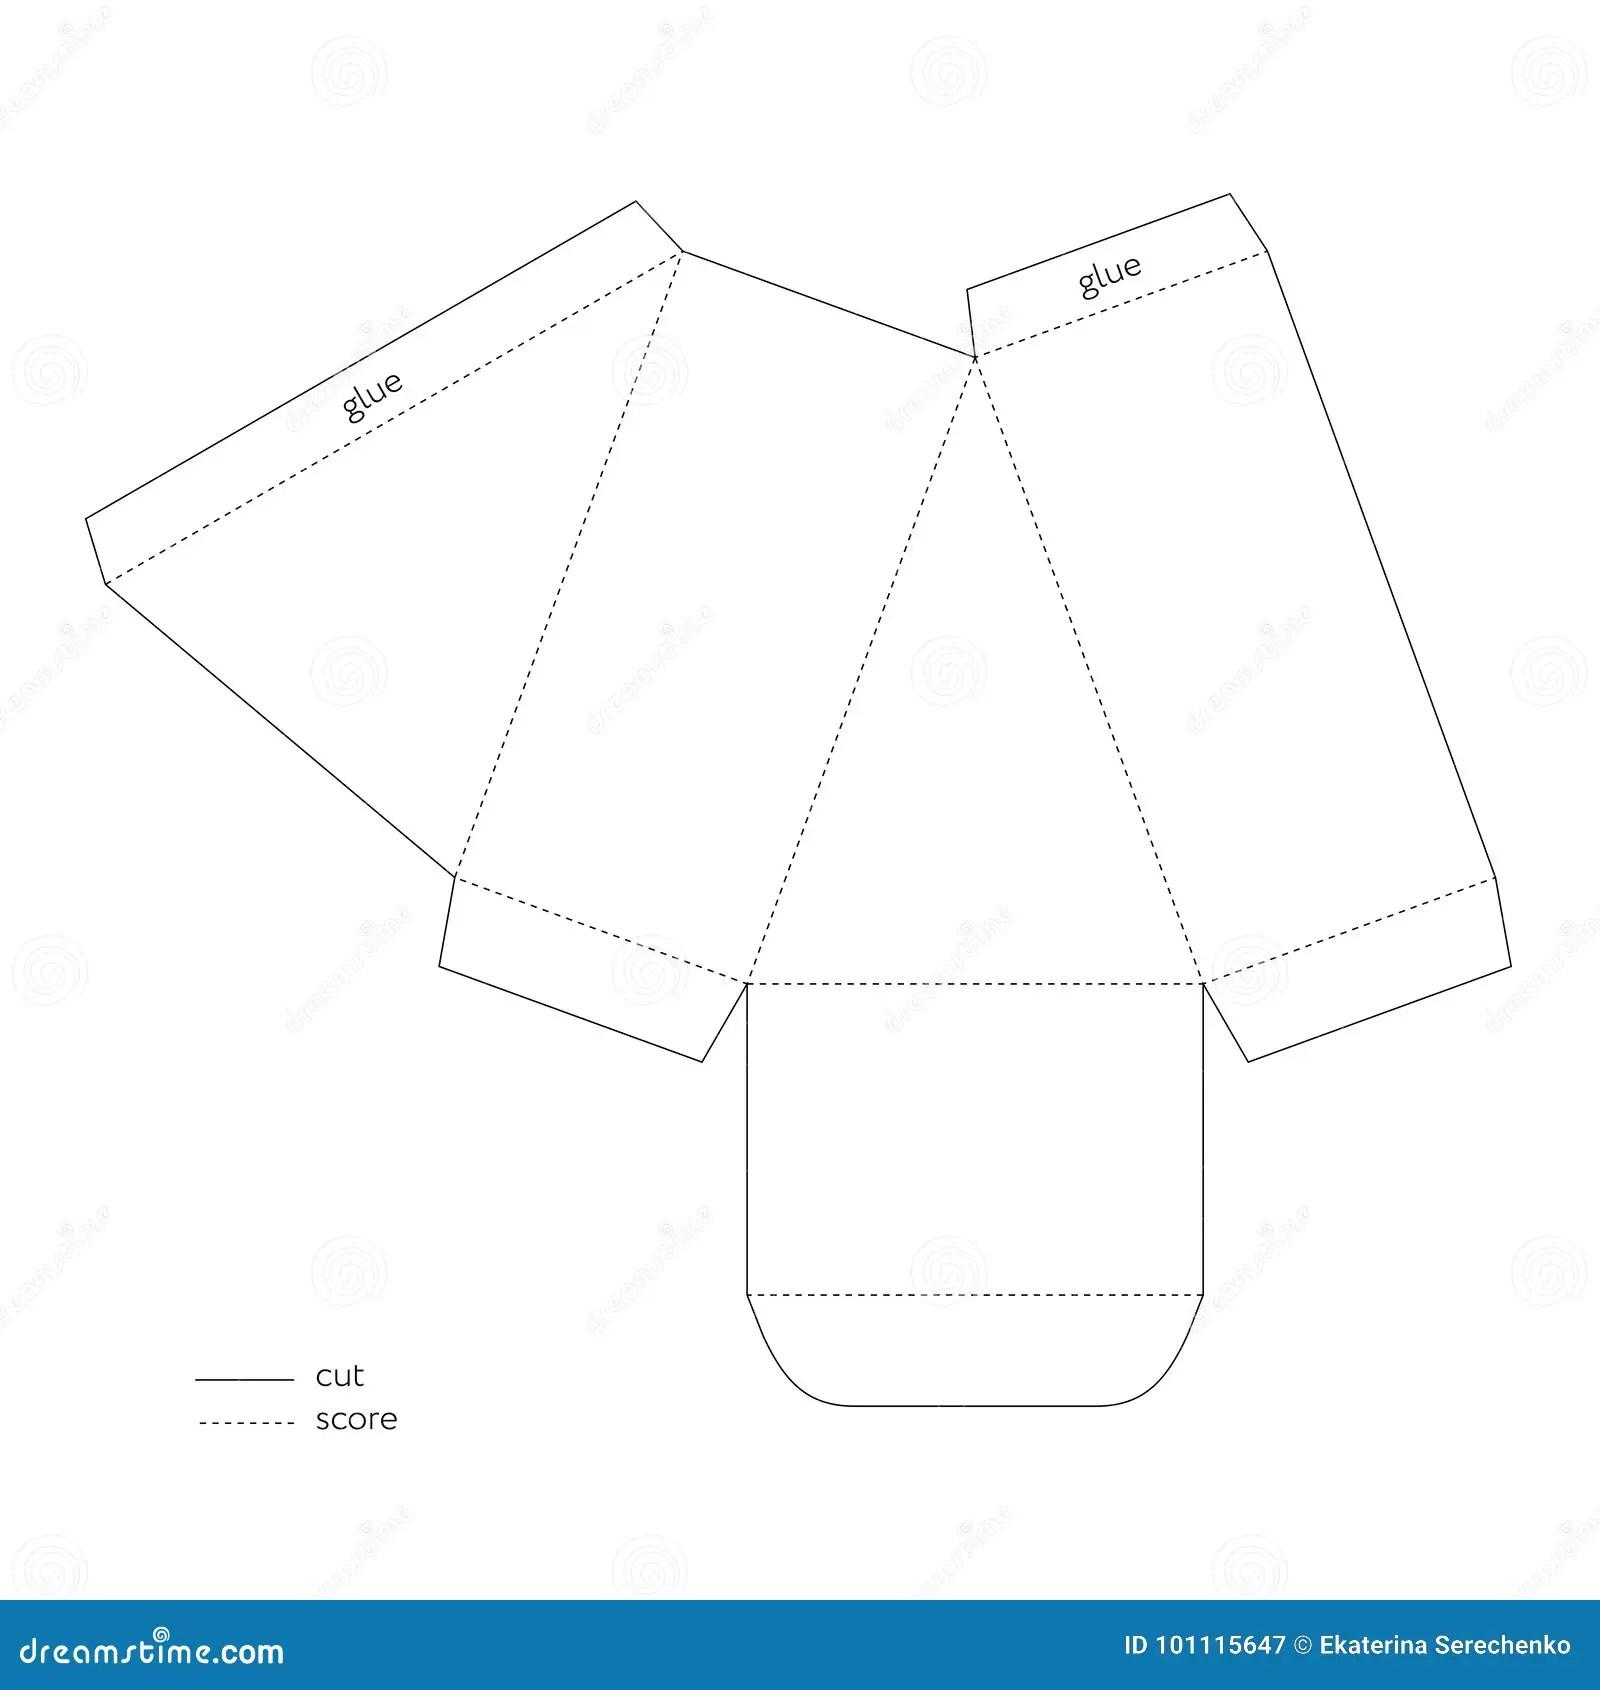 Box Cutout Template. free download sample die cut